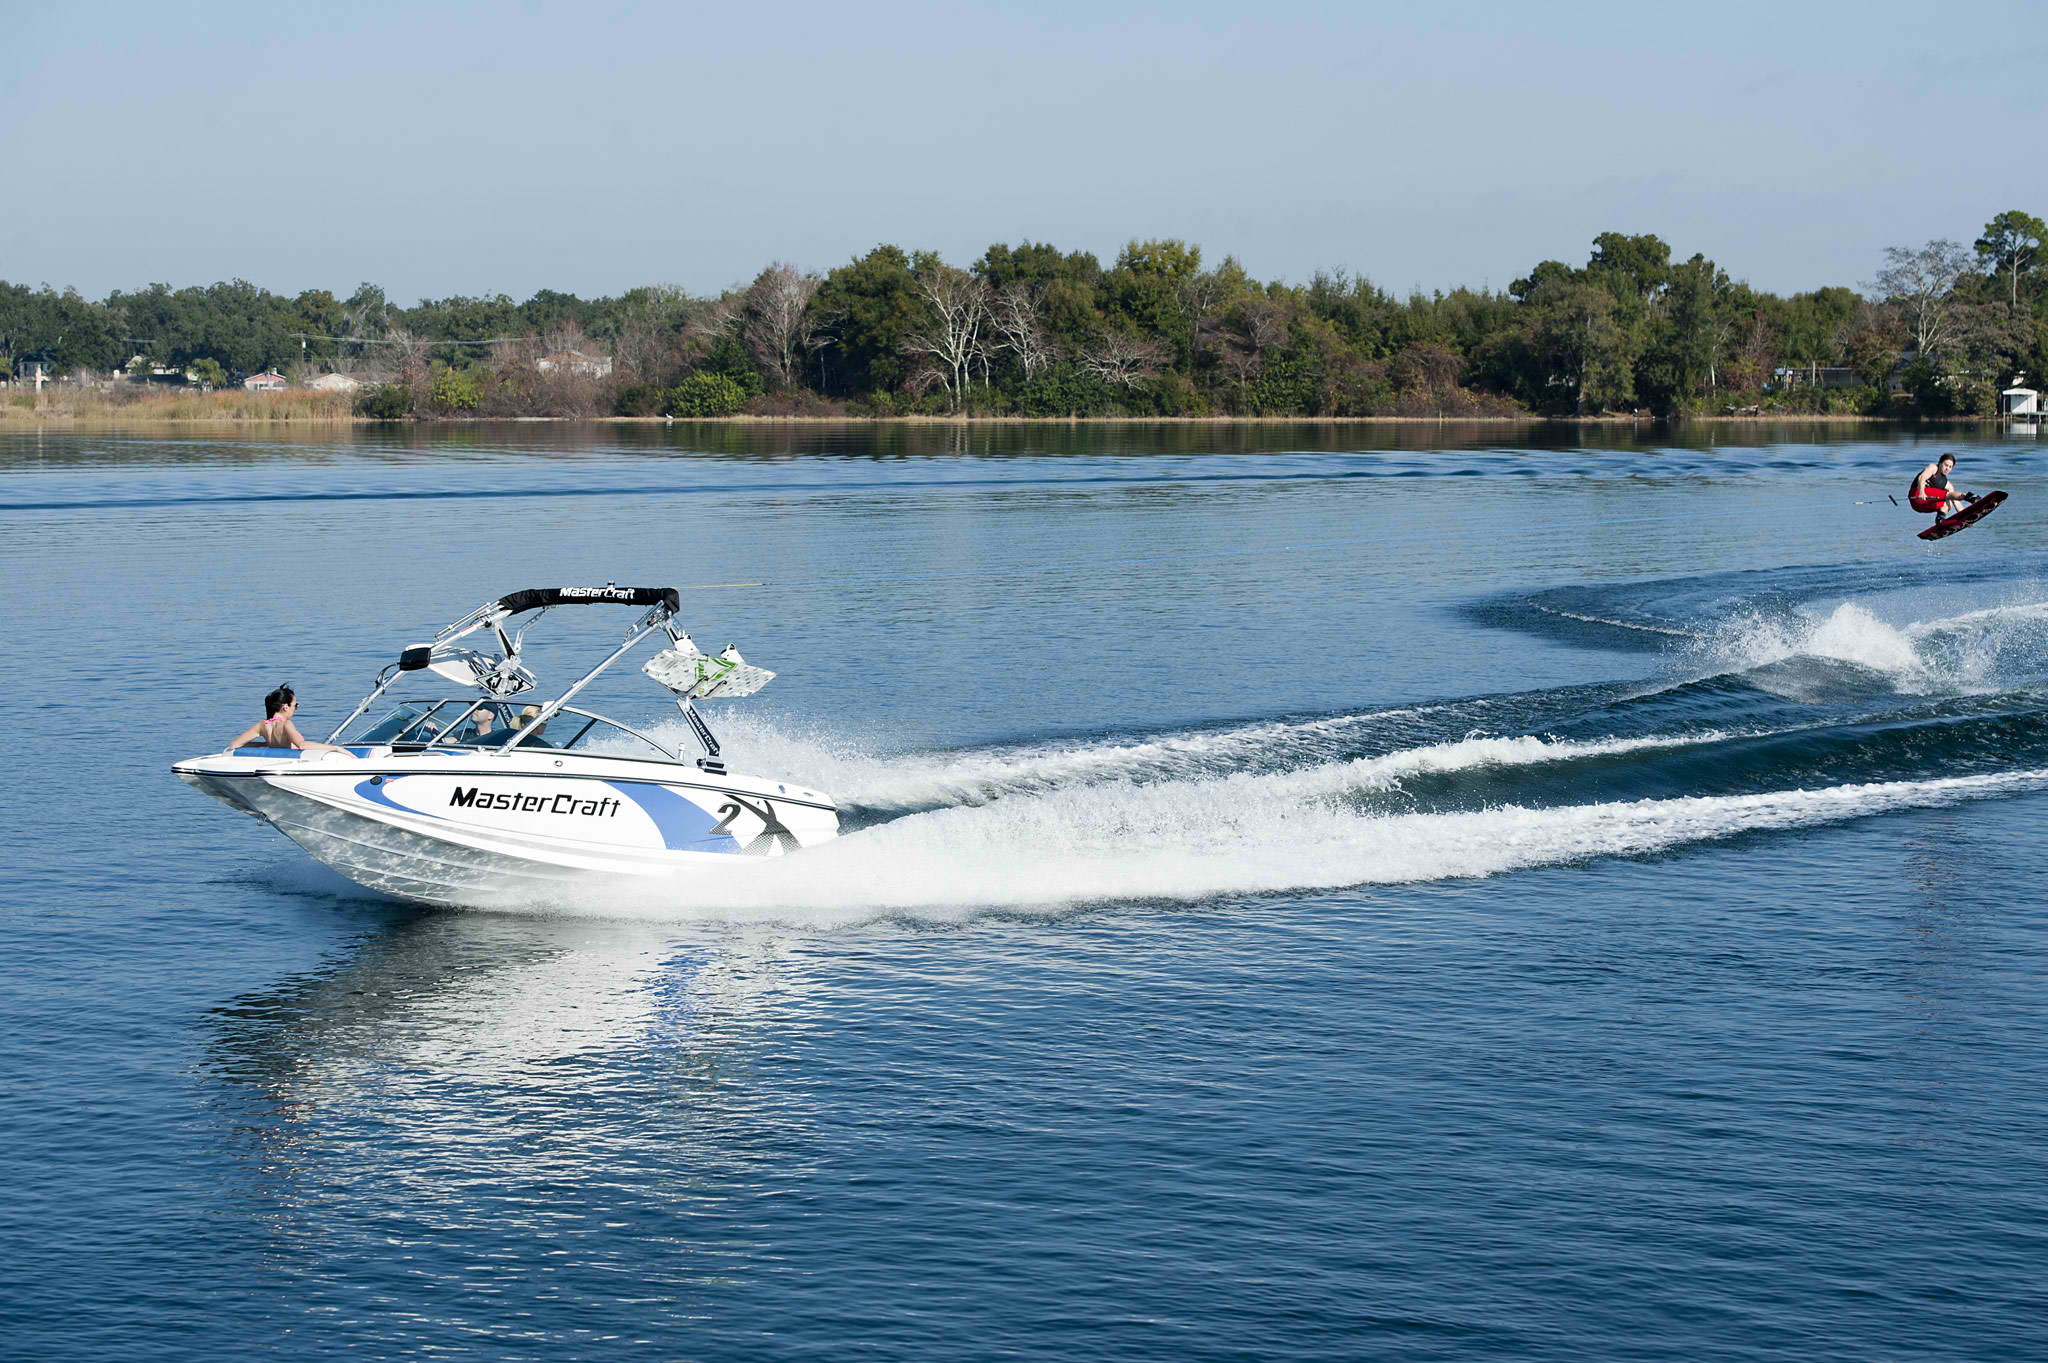 Parker Arizona Boat Rentals And Watercraft Jet Ski Tours